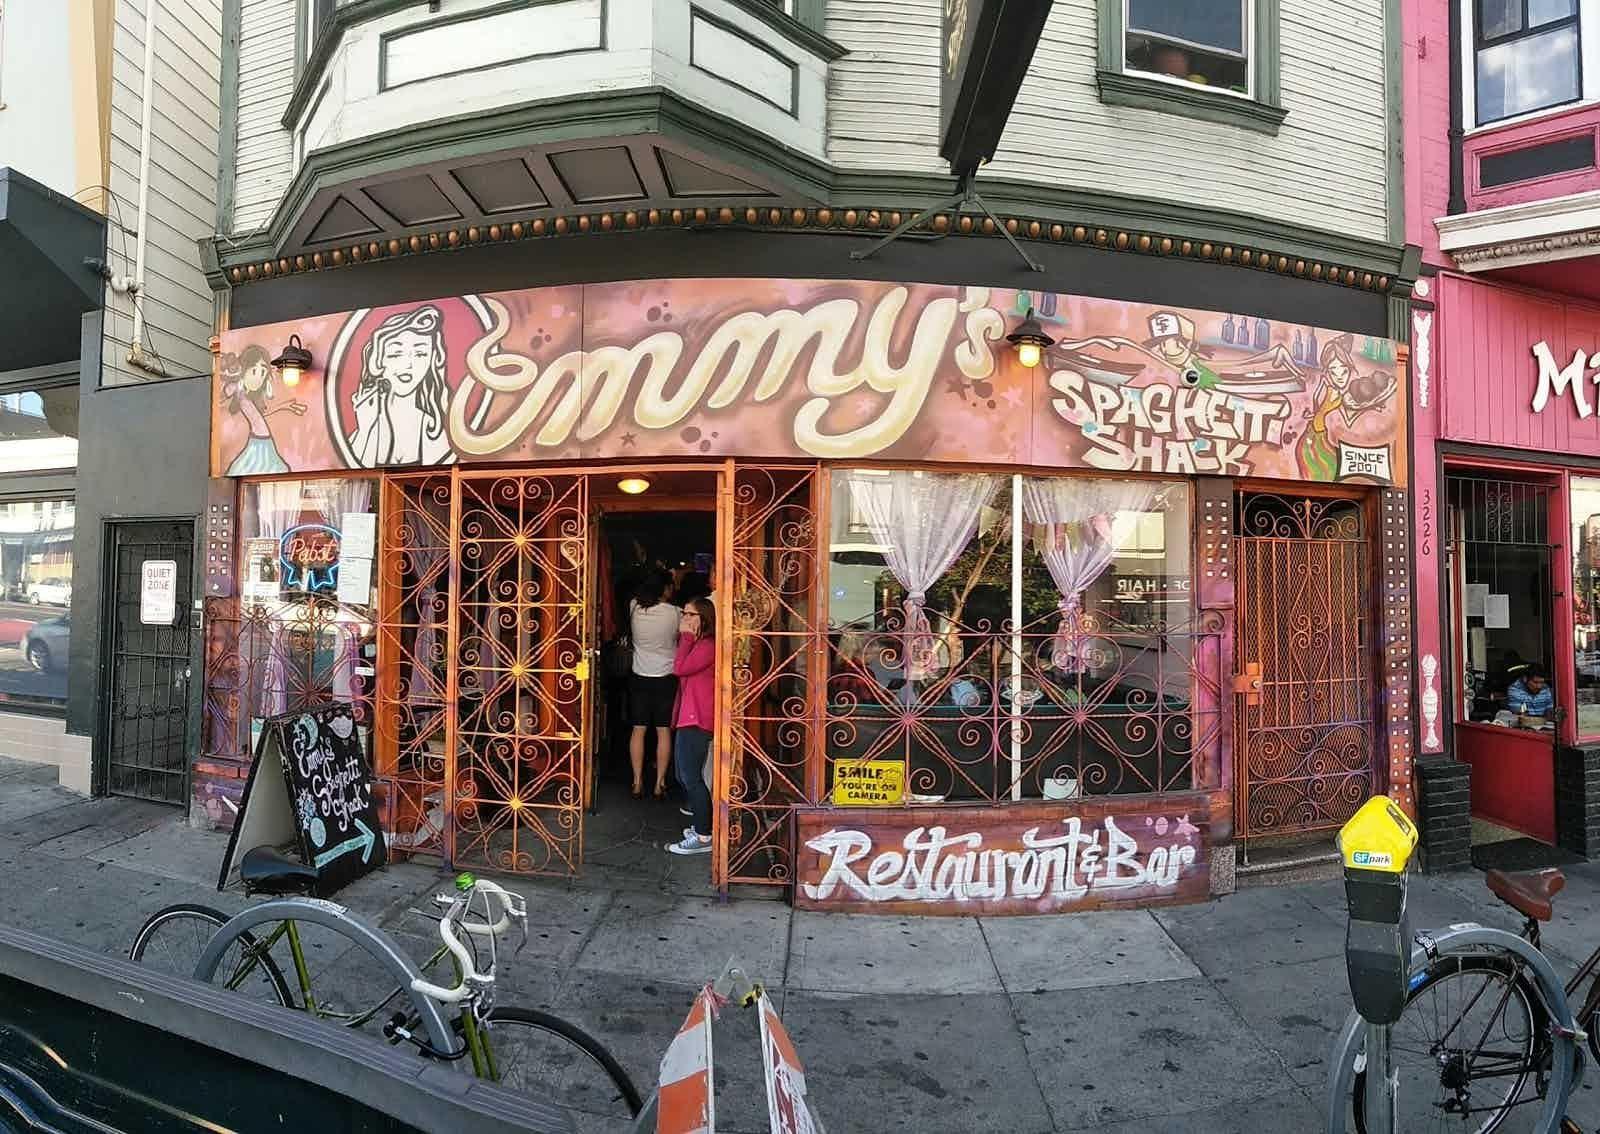 Emmys spaghetti shack spaghetti top restaurants